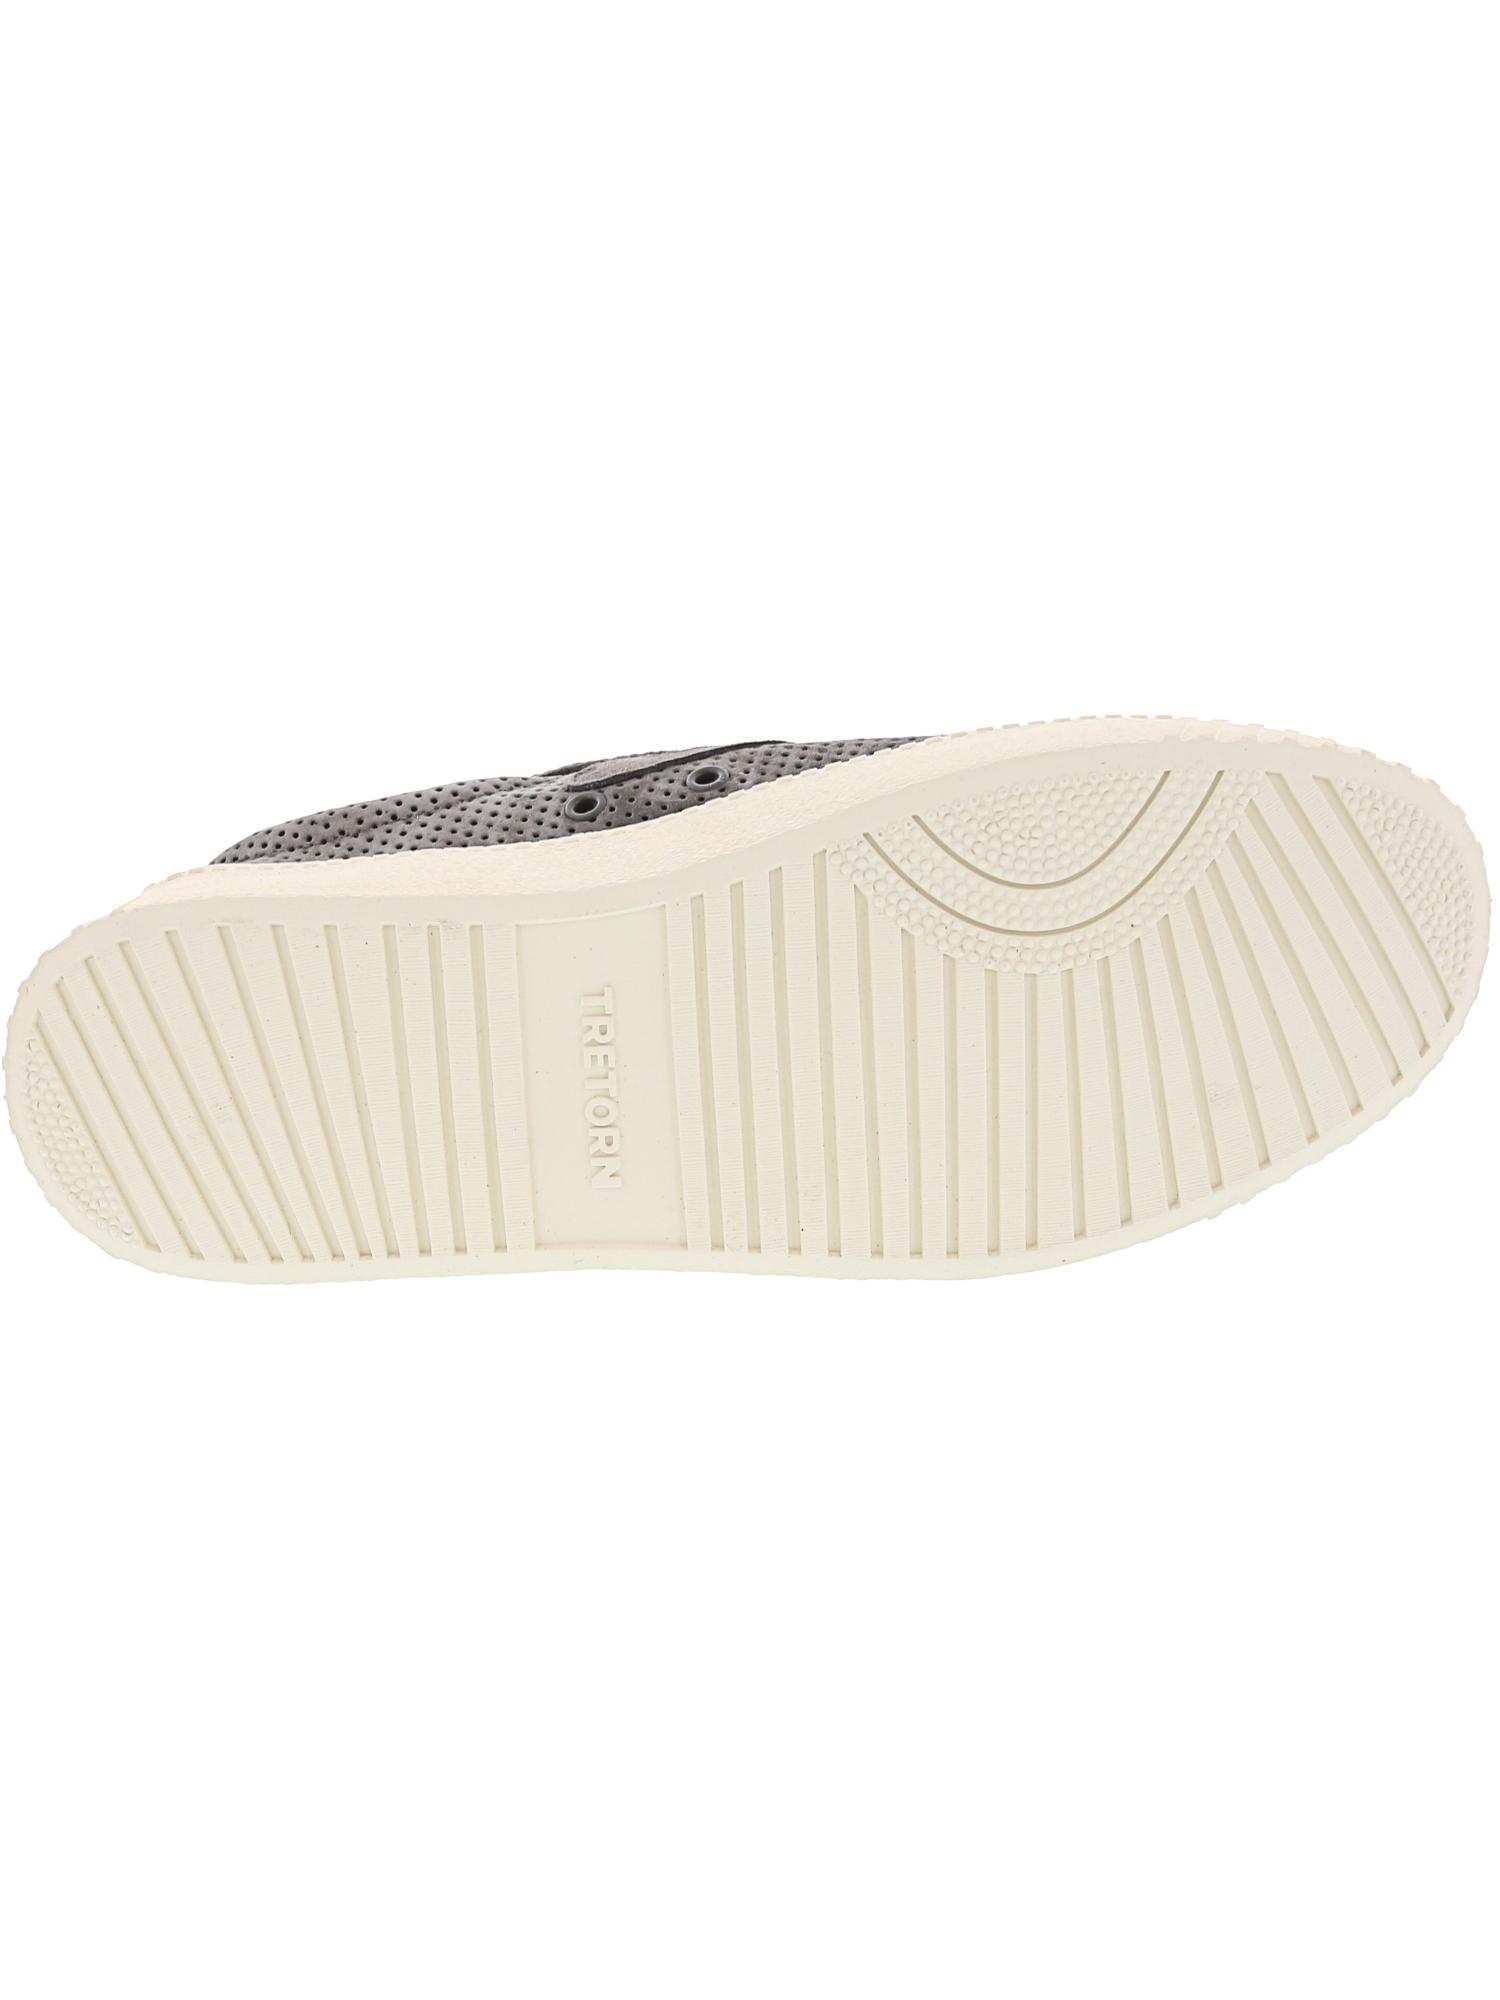 Tretorn-Nylite-3-Bold-Suede-Fashion-Sneaker thumbnail 9